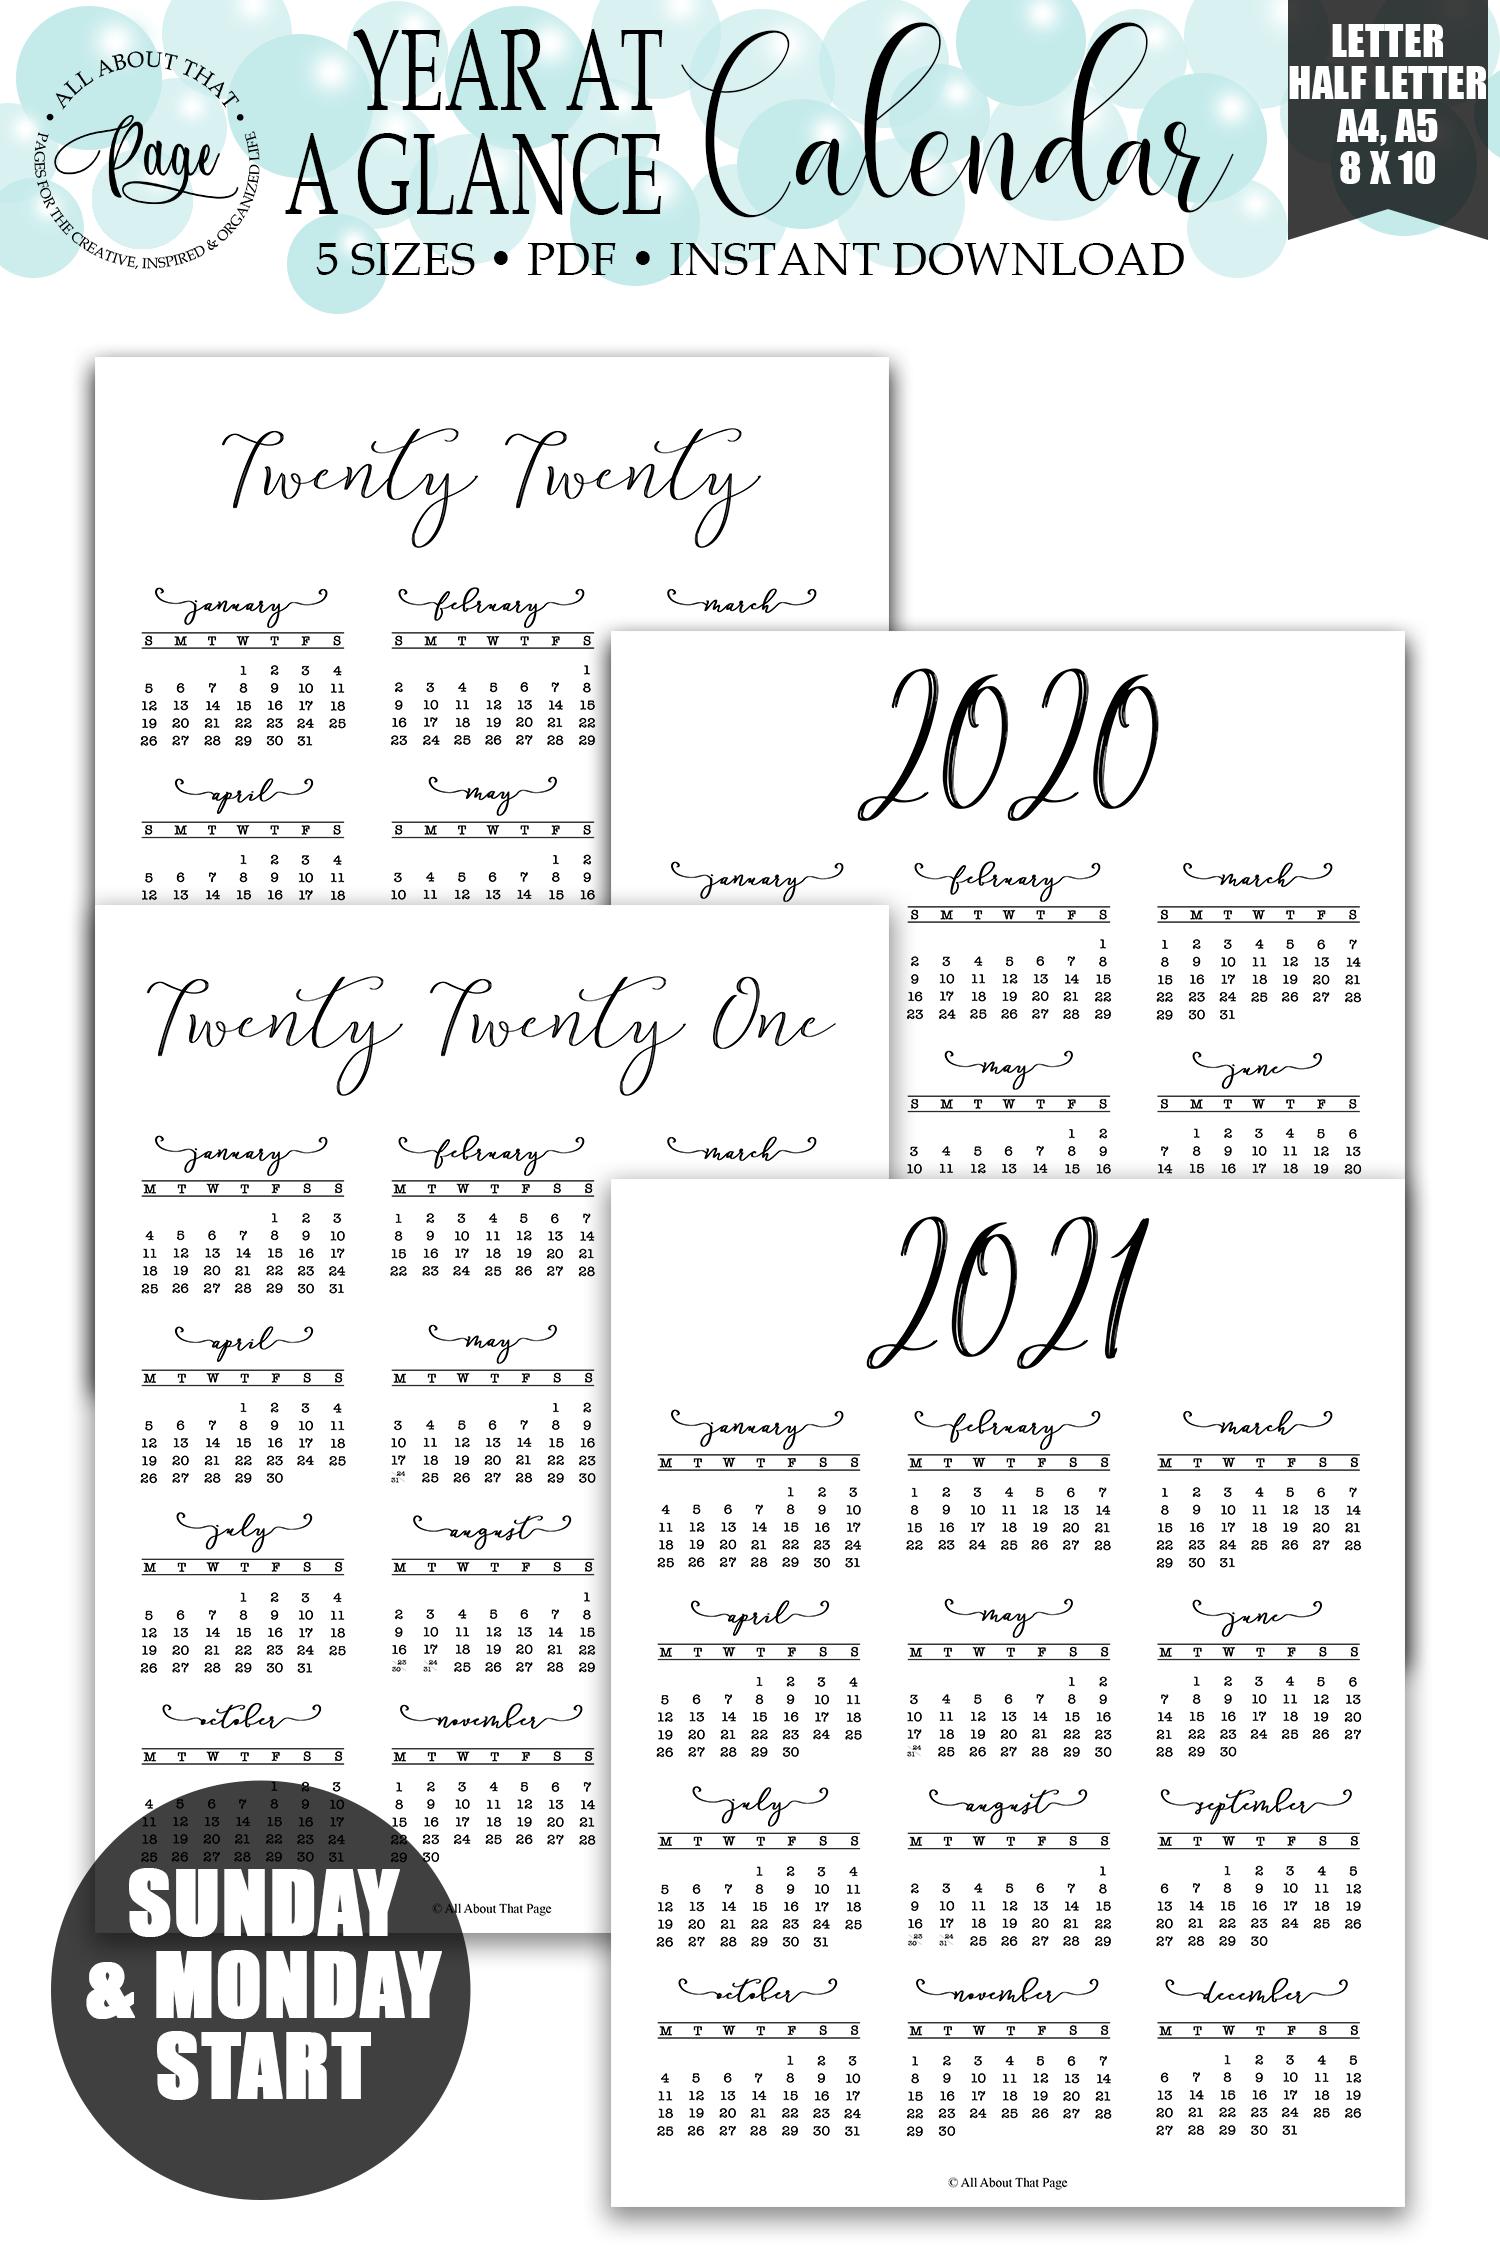 2020 2021 Year At A Glance Calendar Printable, Simple-Large Print 2021 Calendar At A Glance Printable